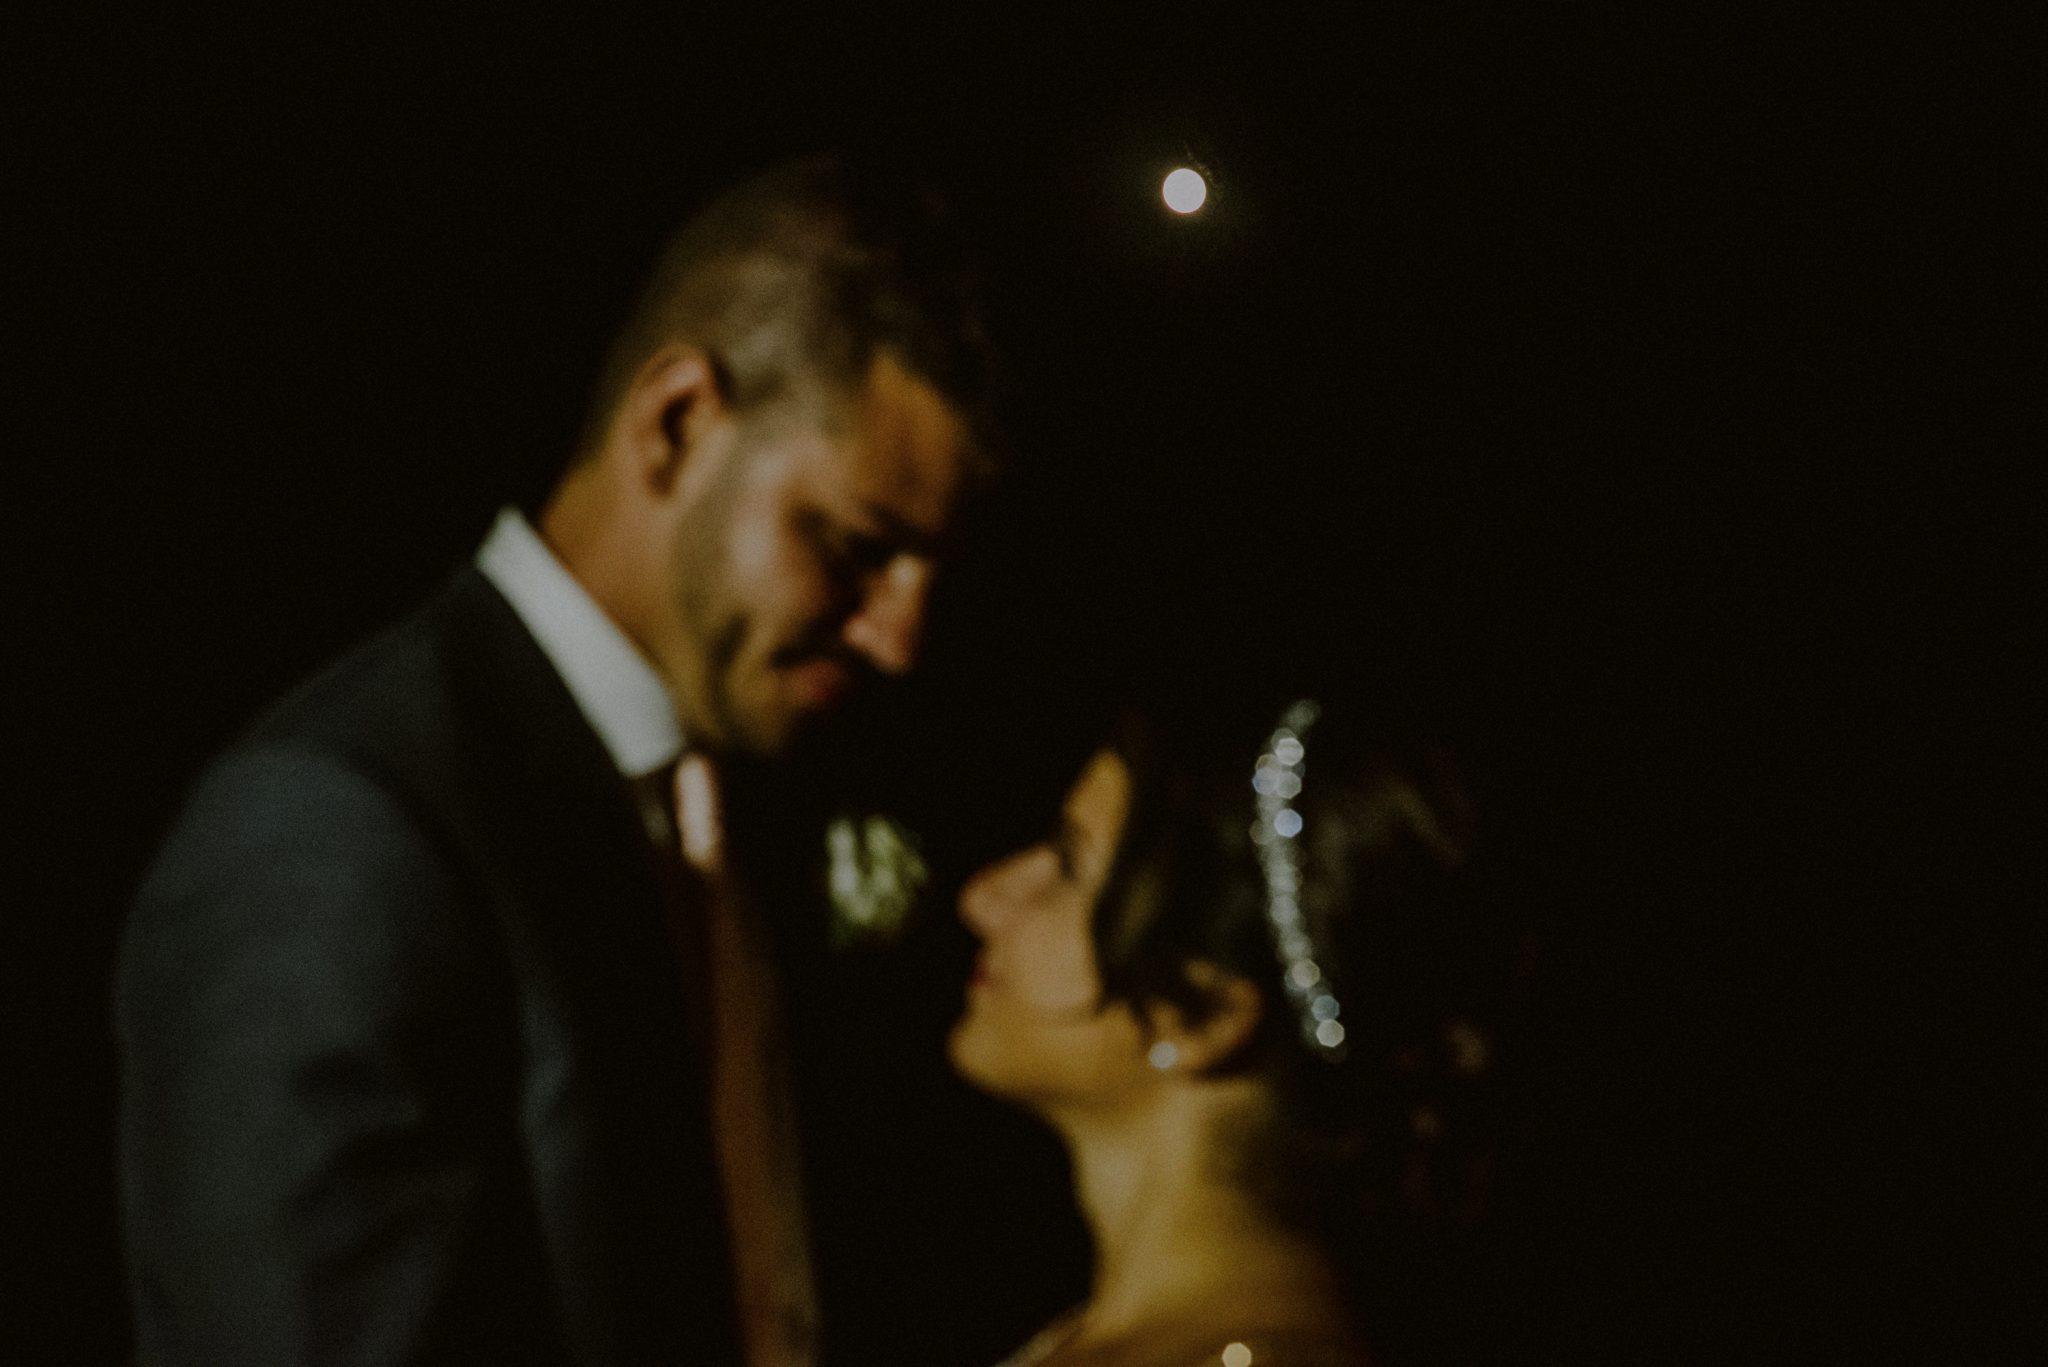 full moon bride and groom